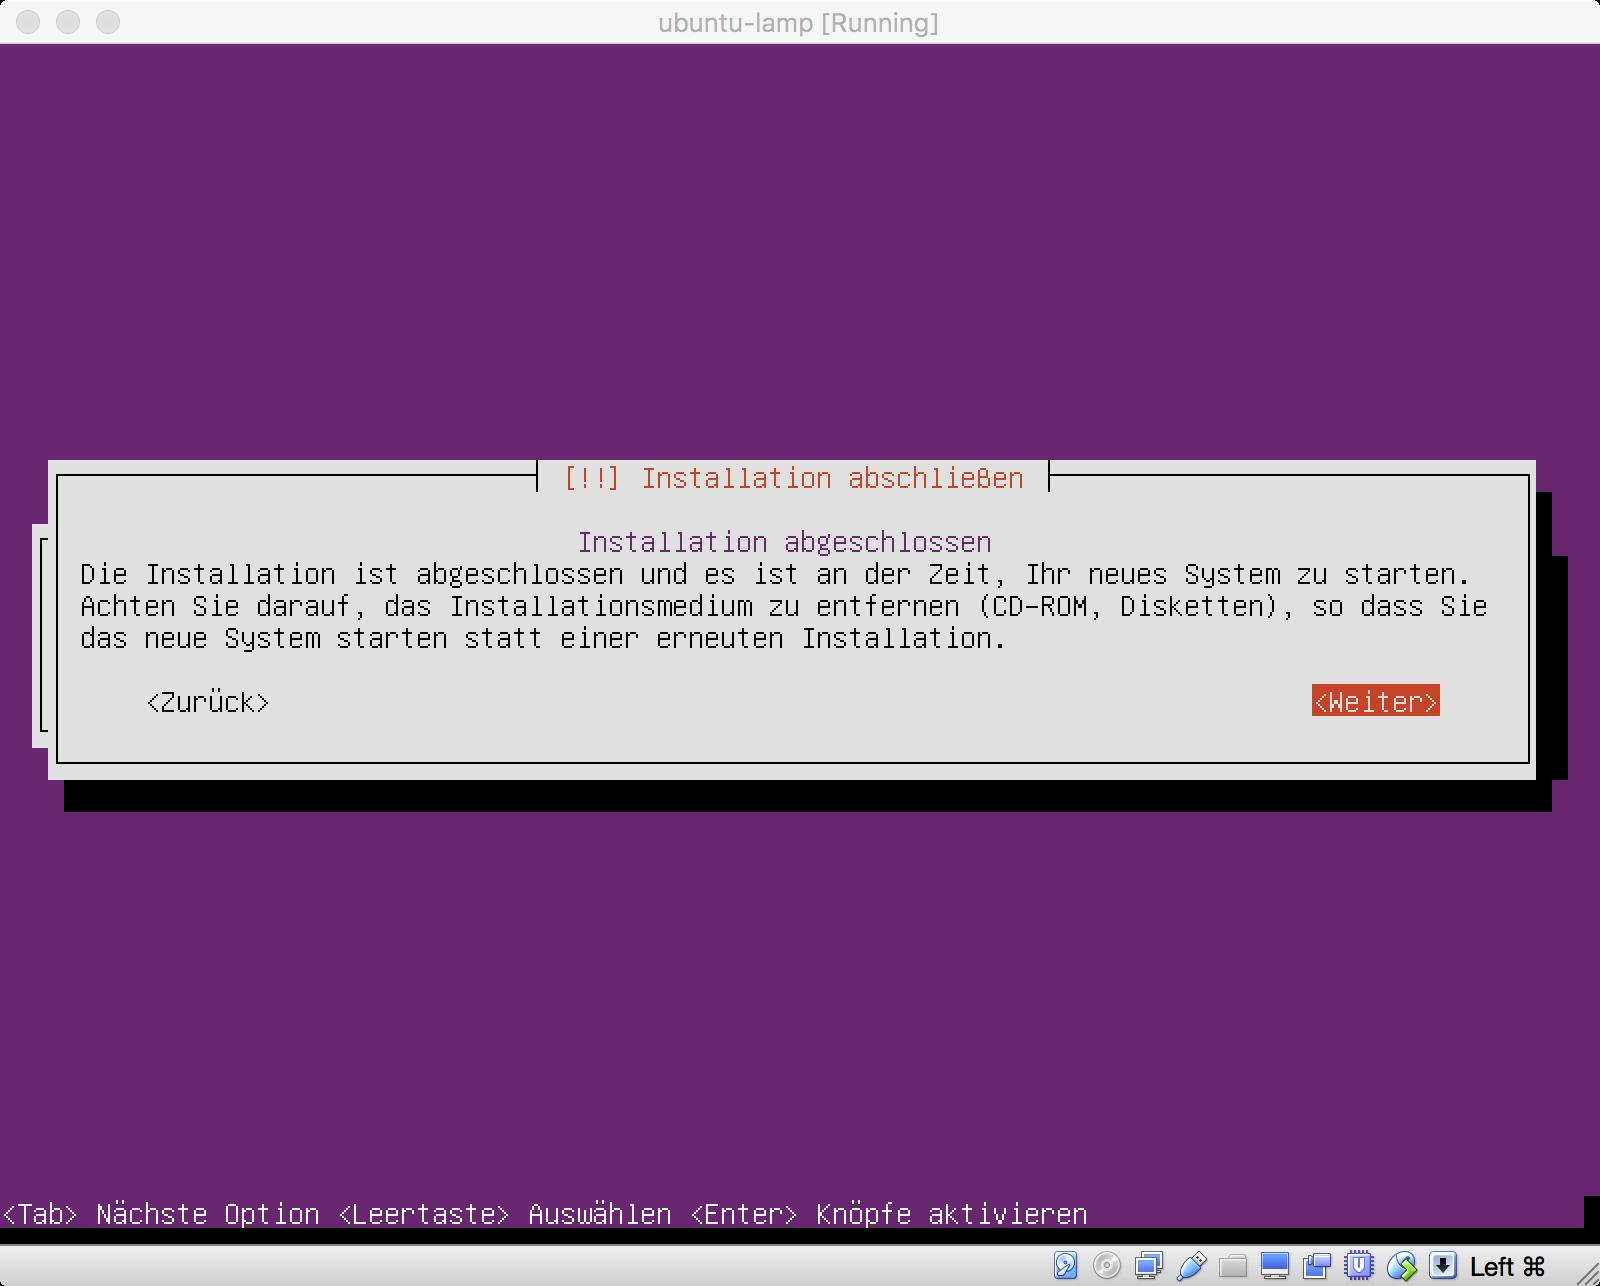 Ubuntu Installation abgeschlossen